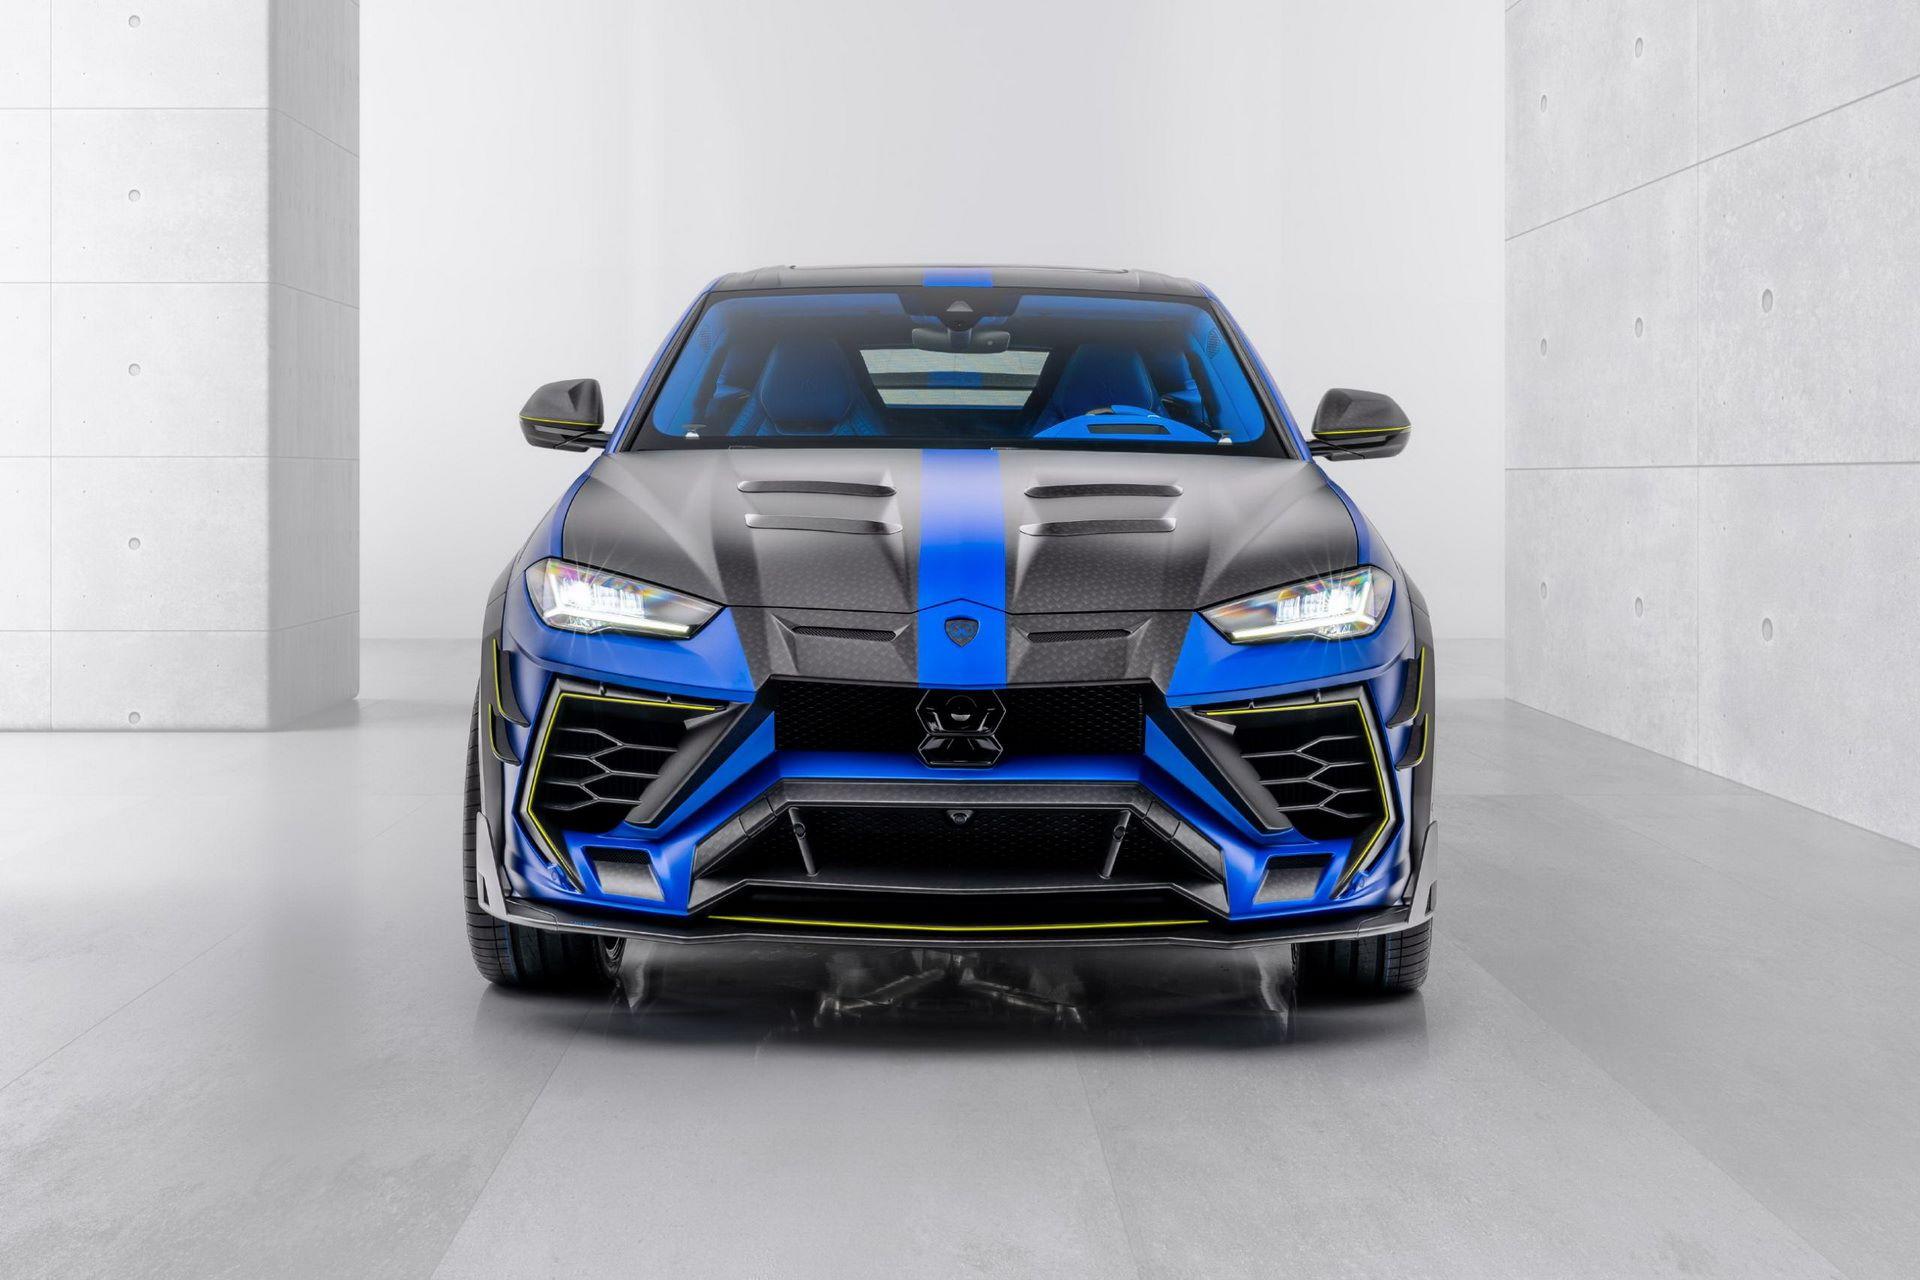 Lamborghini-Urus-Mansory-Venatus-3